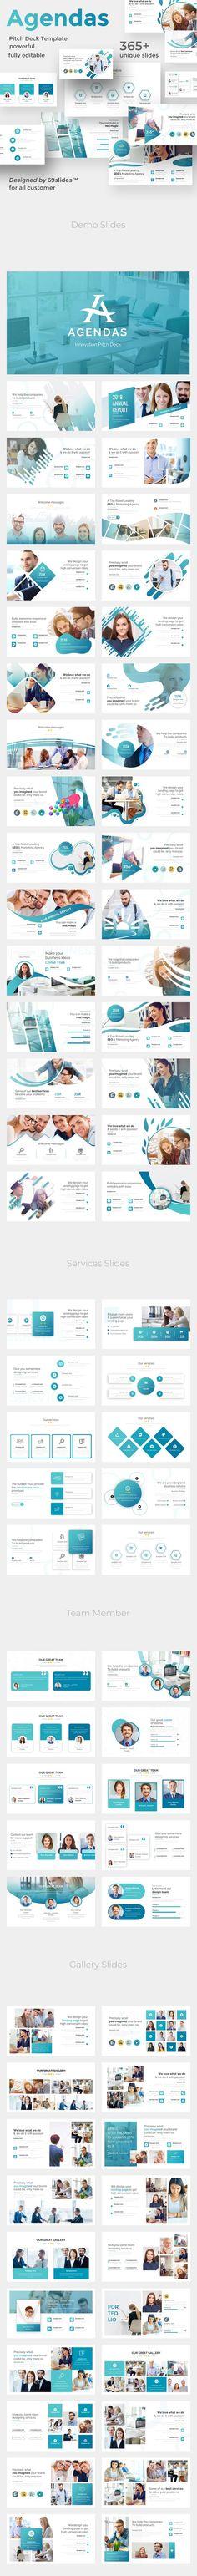 Innovation Agendas Pitch Deck Google Slide Template - Google Slides Presentation Templates Presentation Slides, Business Presentation, Presentation Design, Presentation Templates, Pitch Deck, Creative Powerpoint Templates, Website Design Inspiration, Keynote Template, Business Design